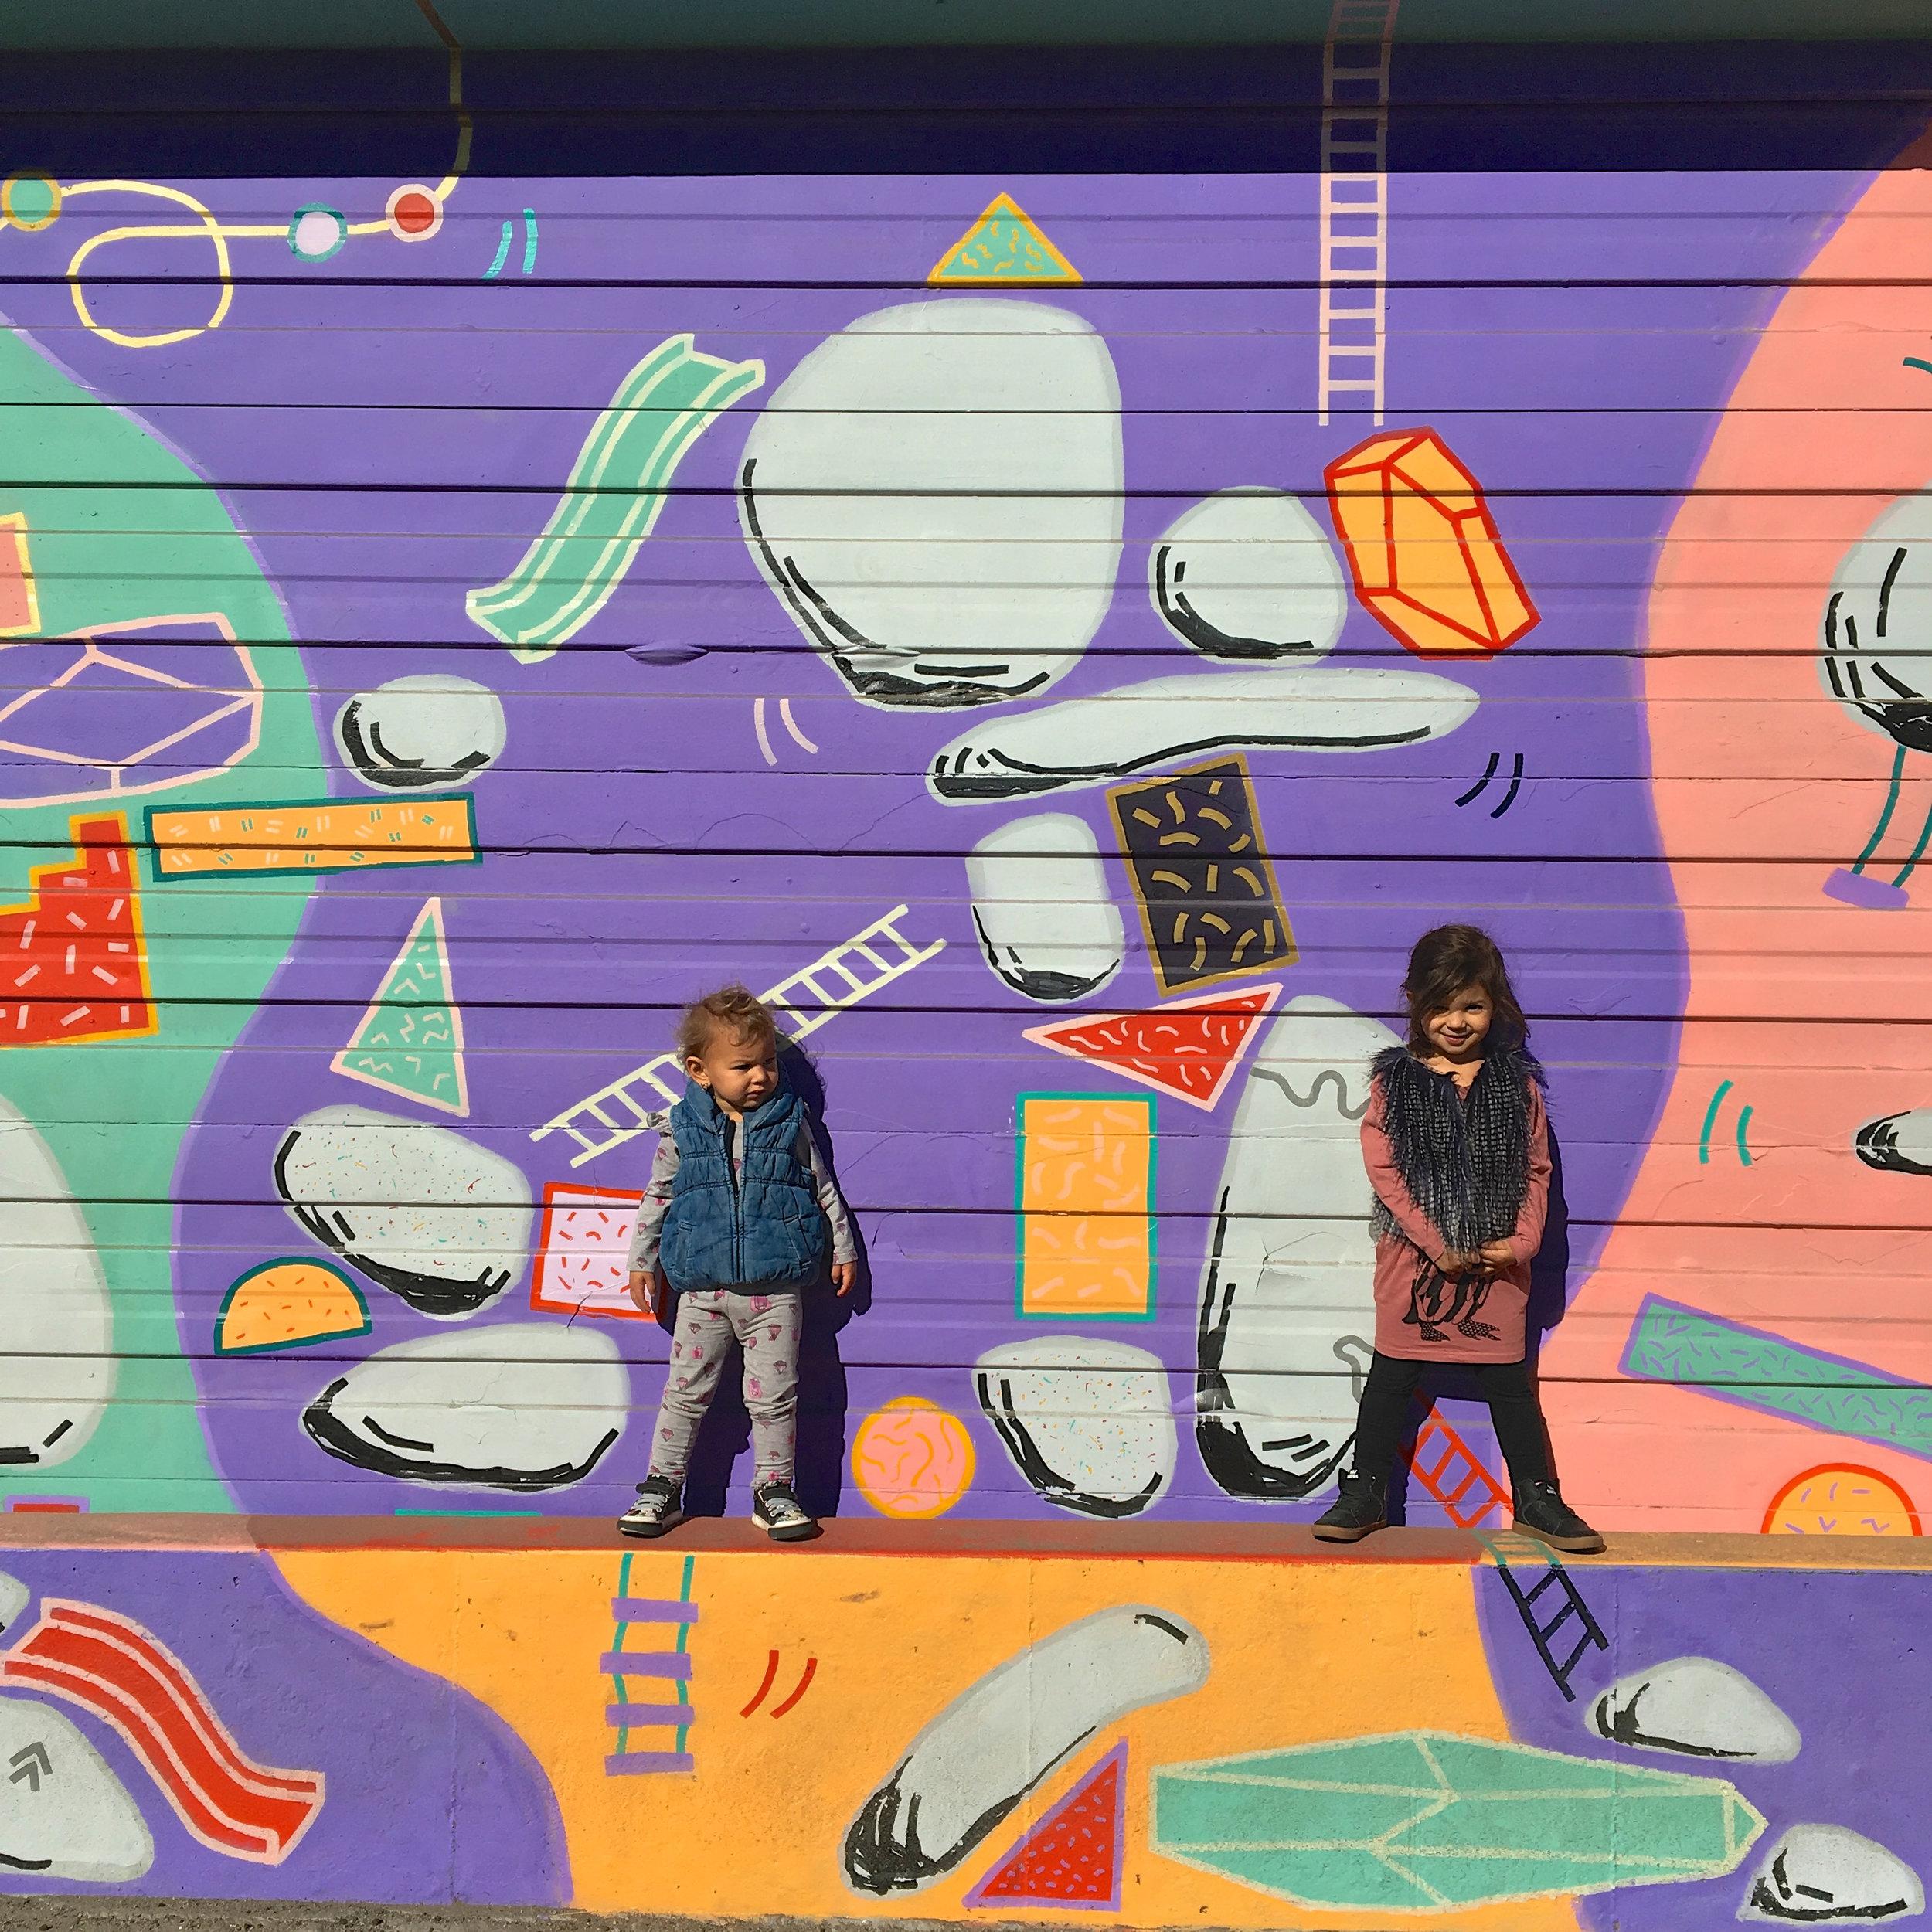 RiNo-Denver-Colorado-Crush-Walls-2017-3.jpg